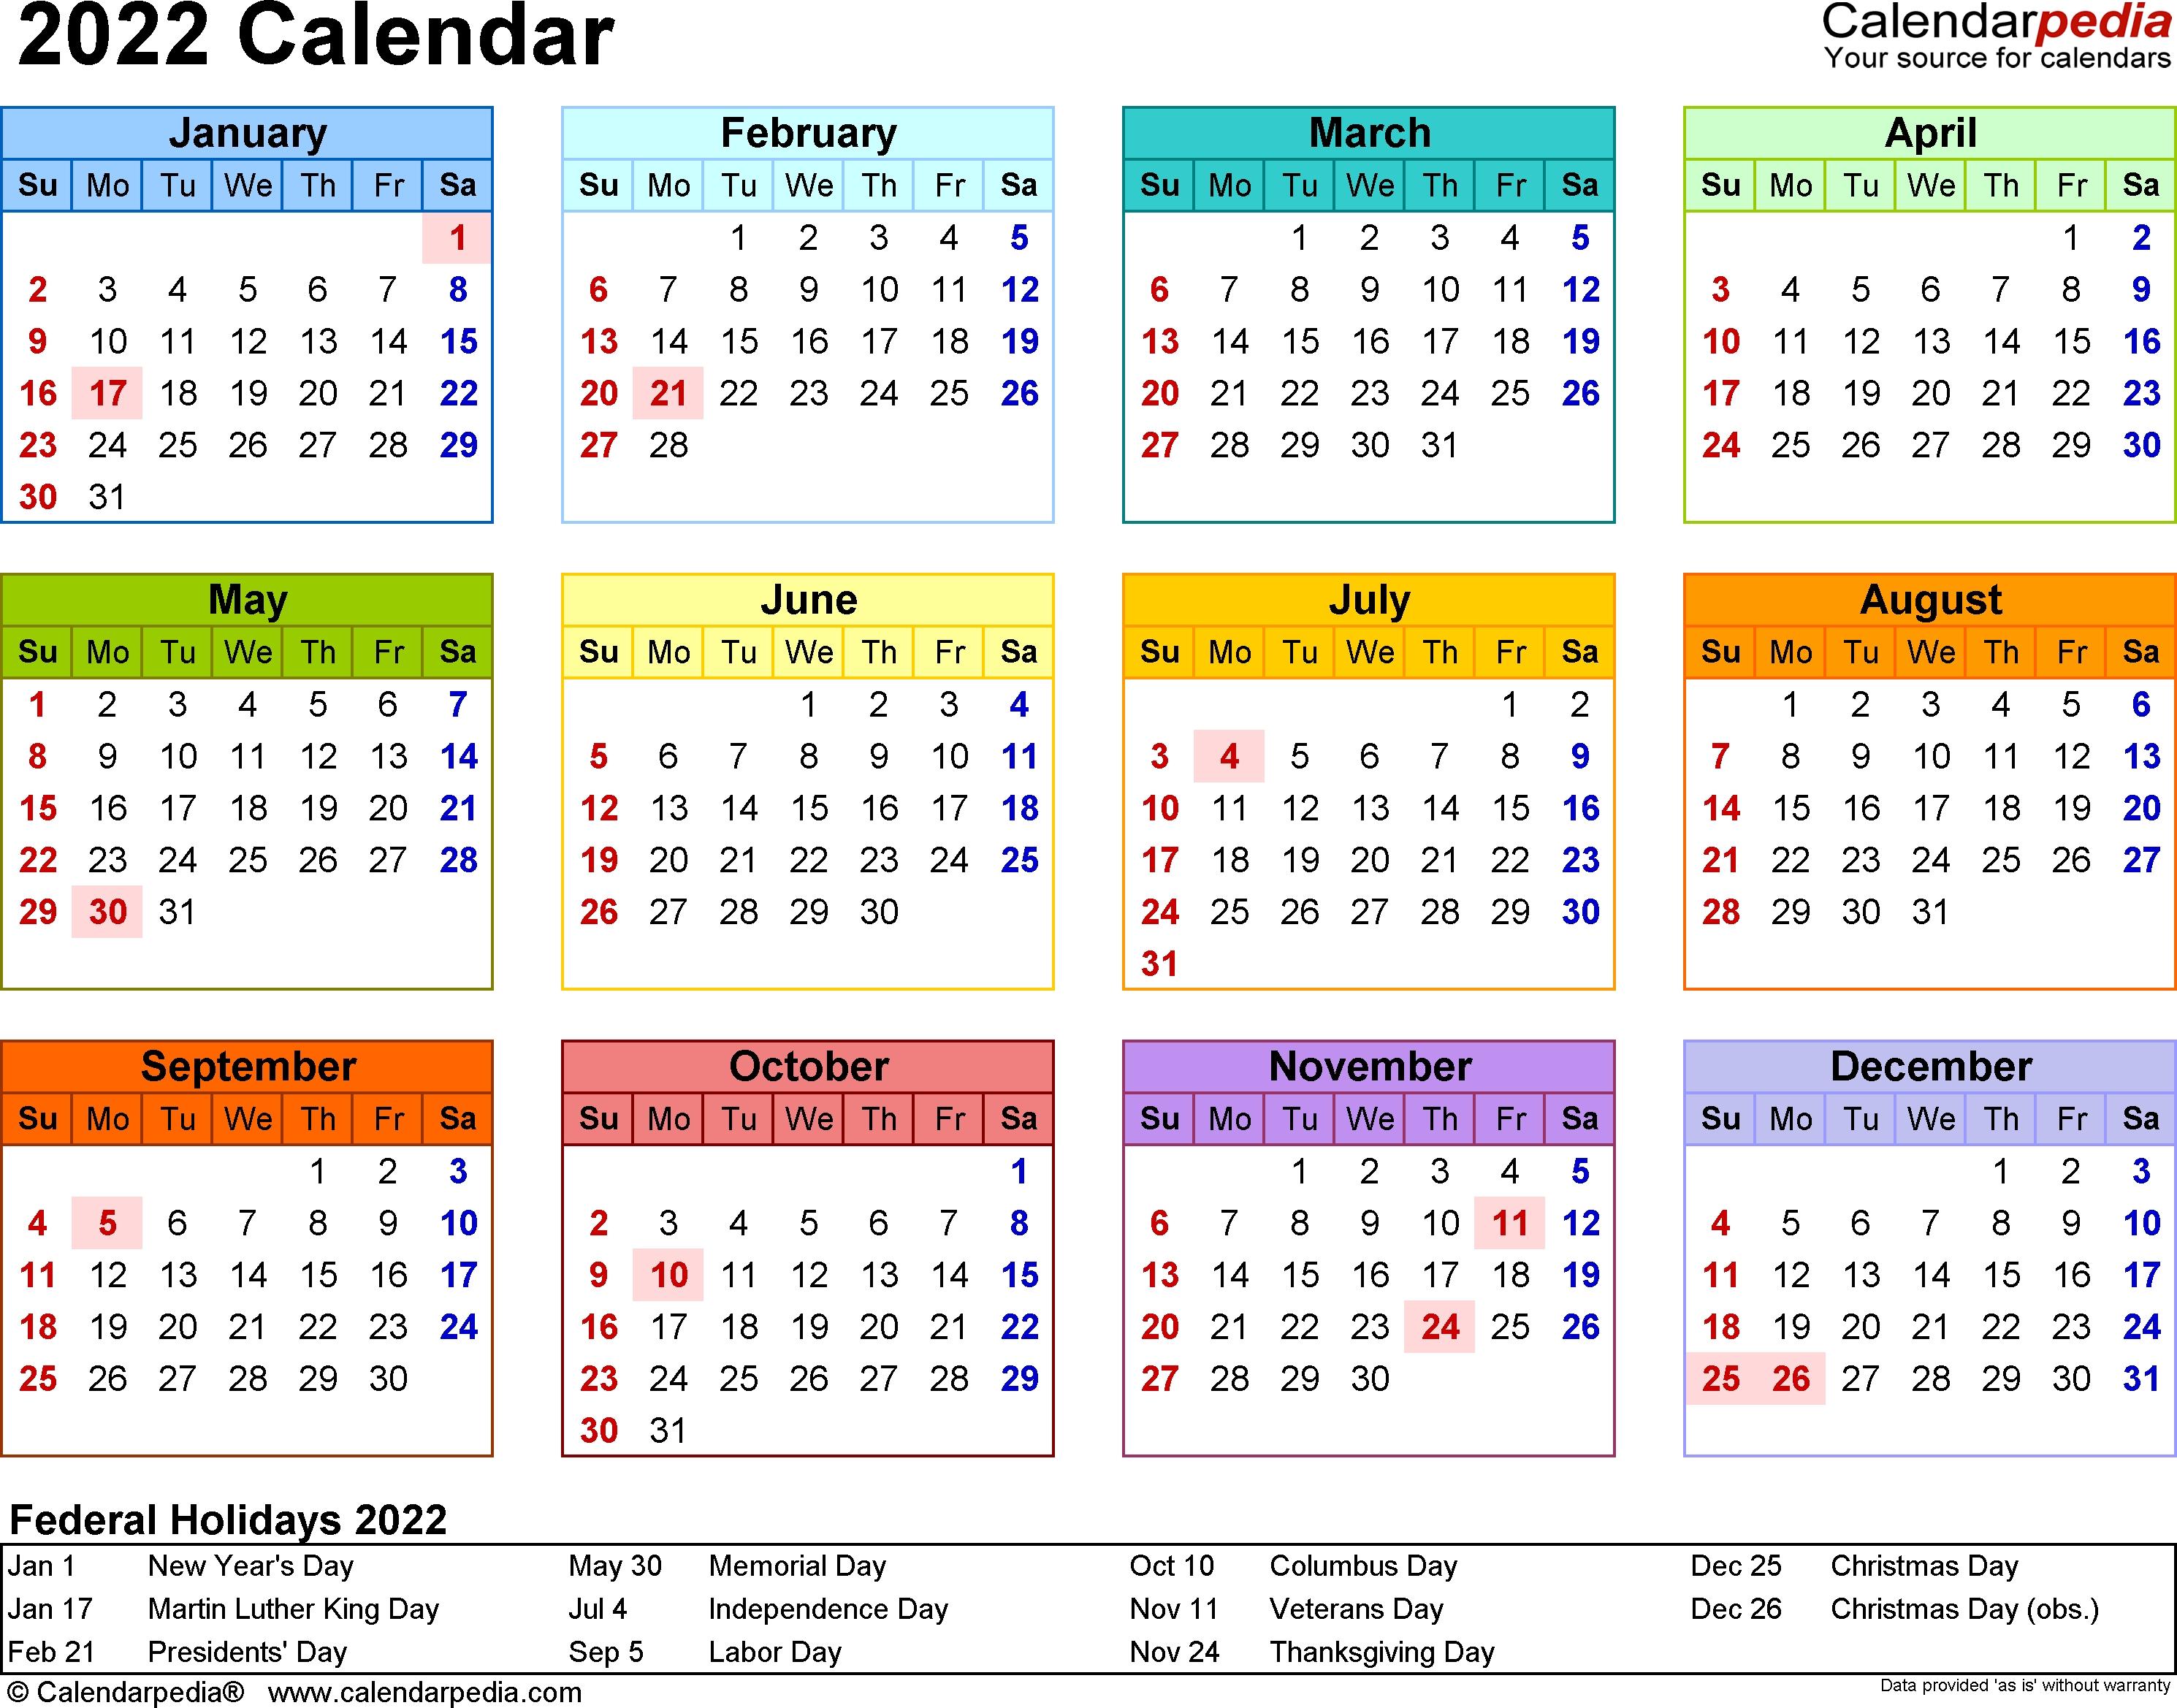 Printable calendar 2022, free download yearly calendar templates. Calendar Year At A Glance - Calendar Inspiration Design